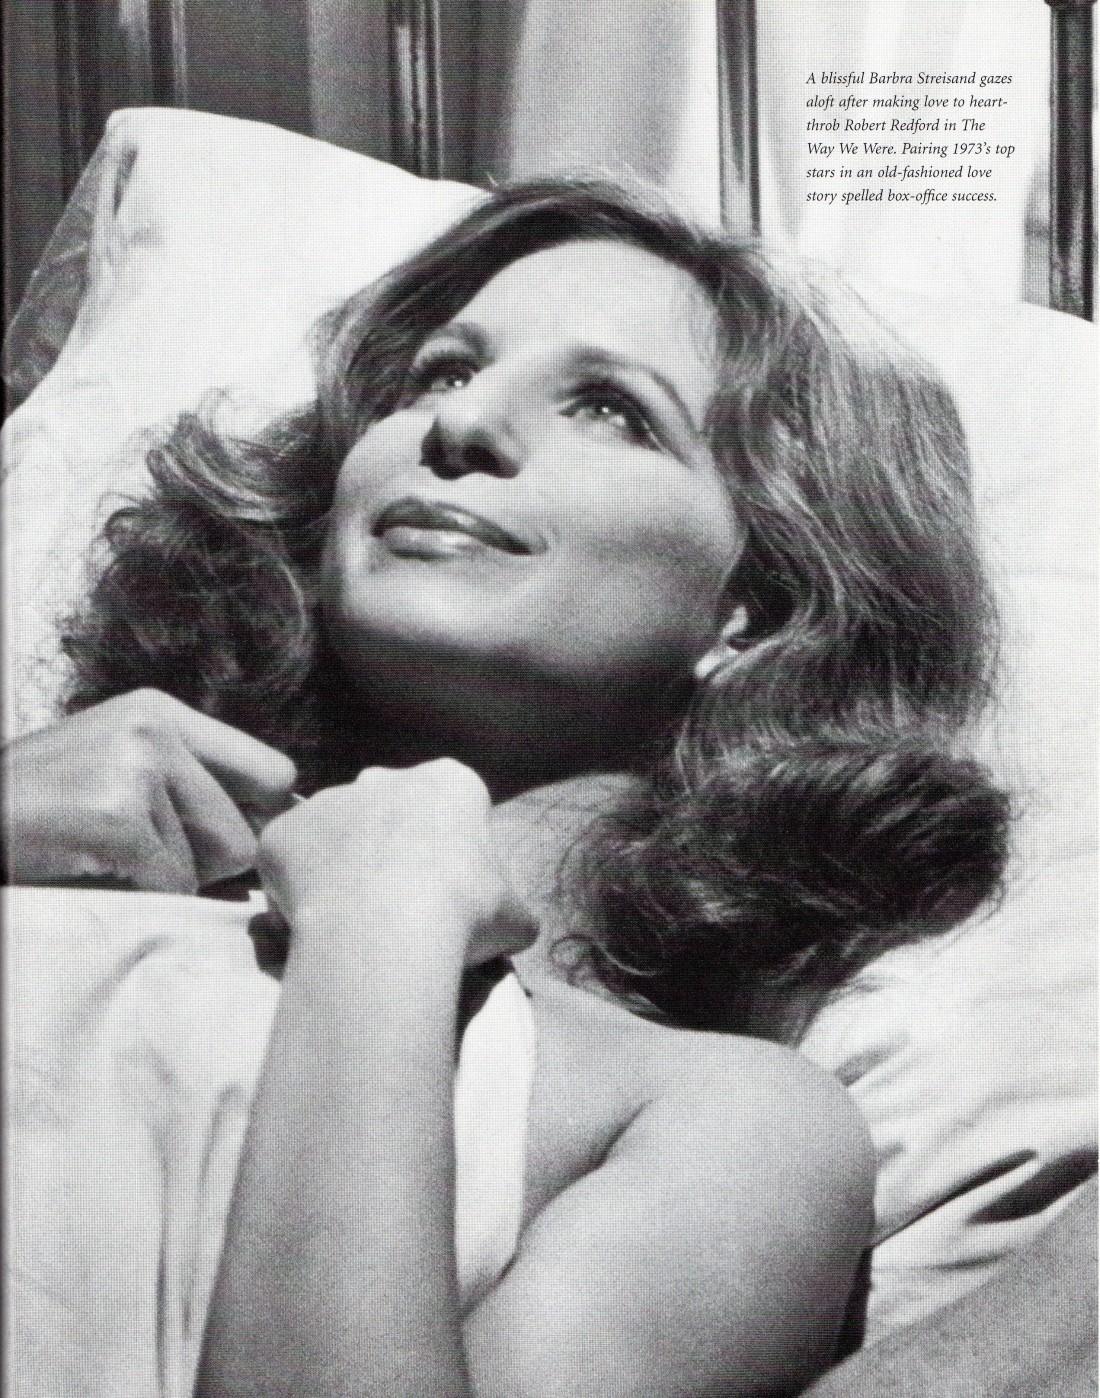 Barbra Streisand – The Way We Were Lyrics | Genius Lyrics